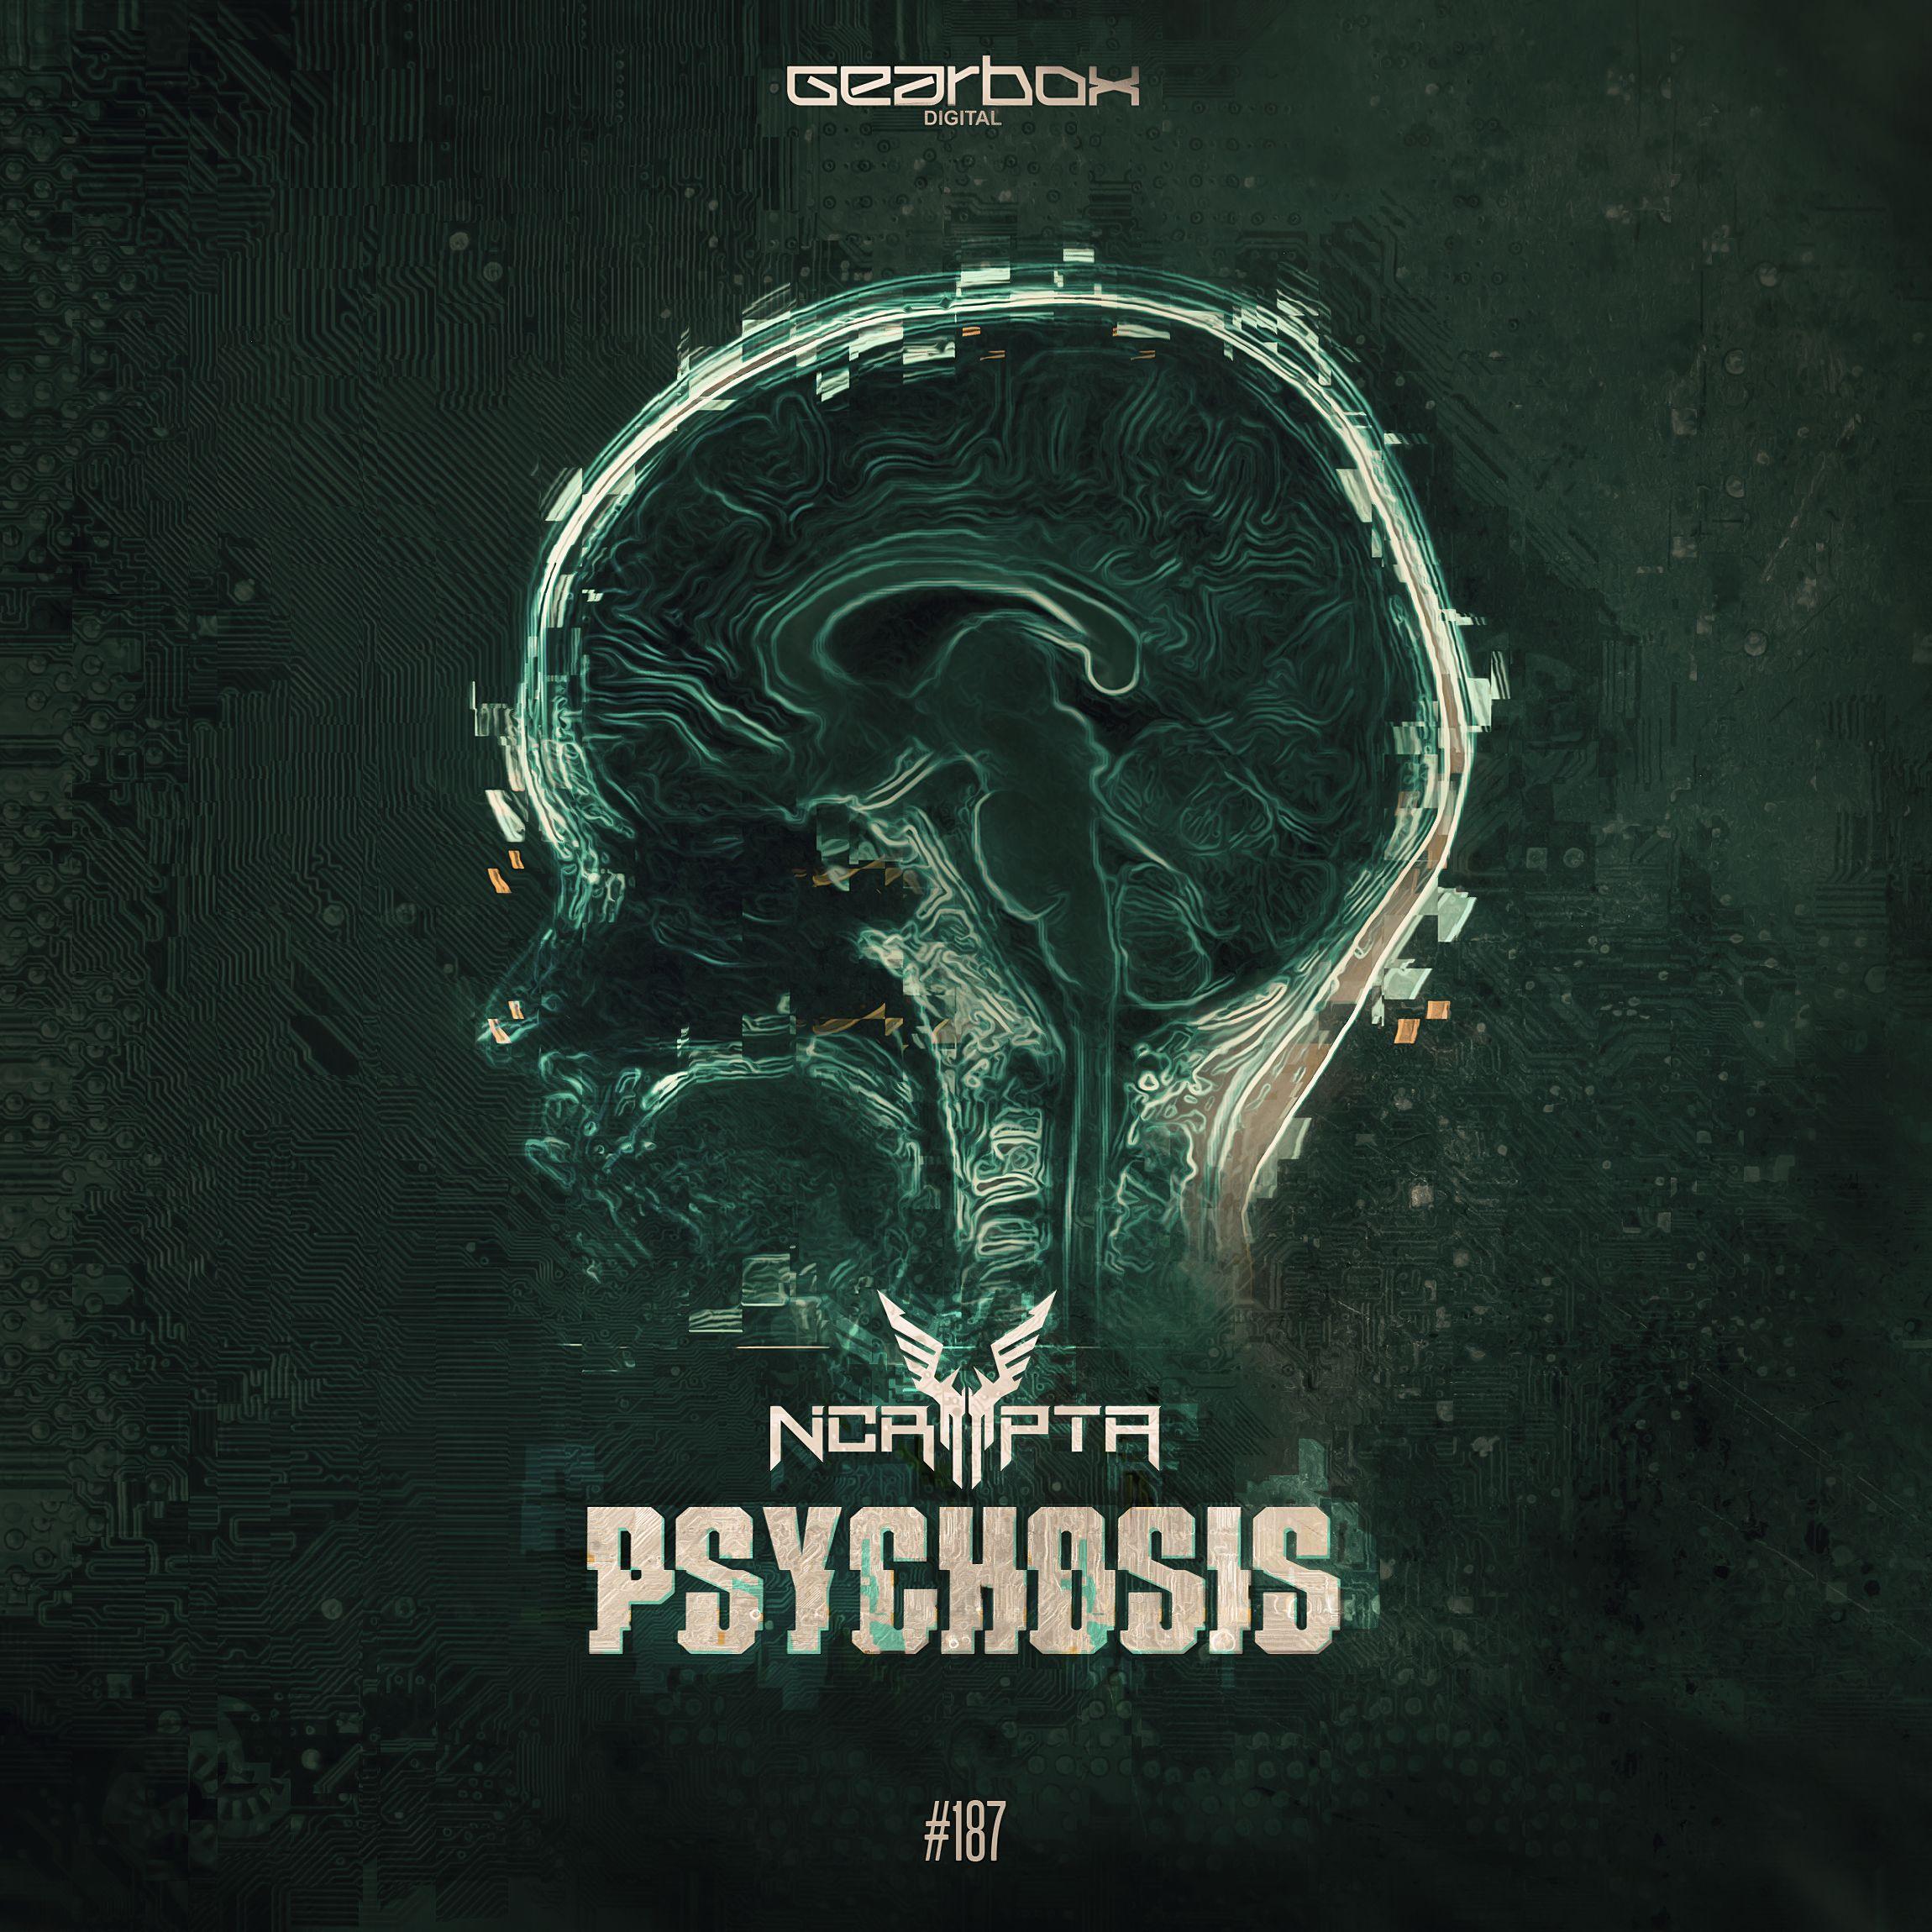 Ncrypta - Psychosis I EP [GEARBOX DIGITAL] GBD187